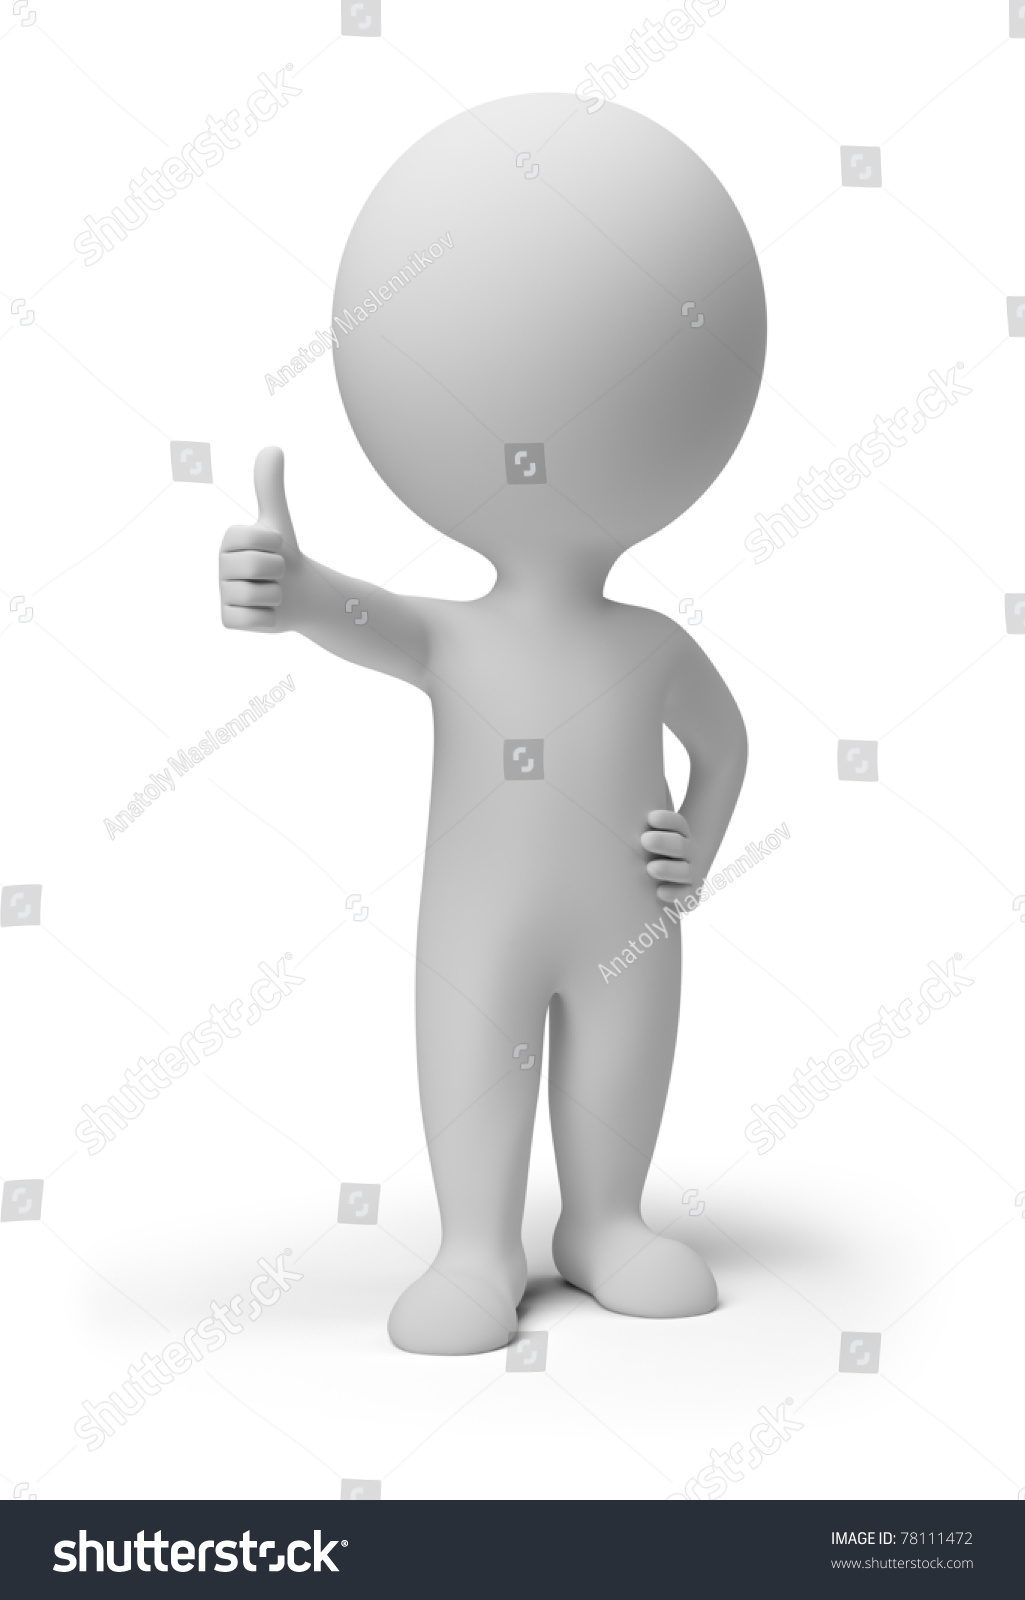 small headed person